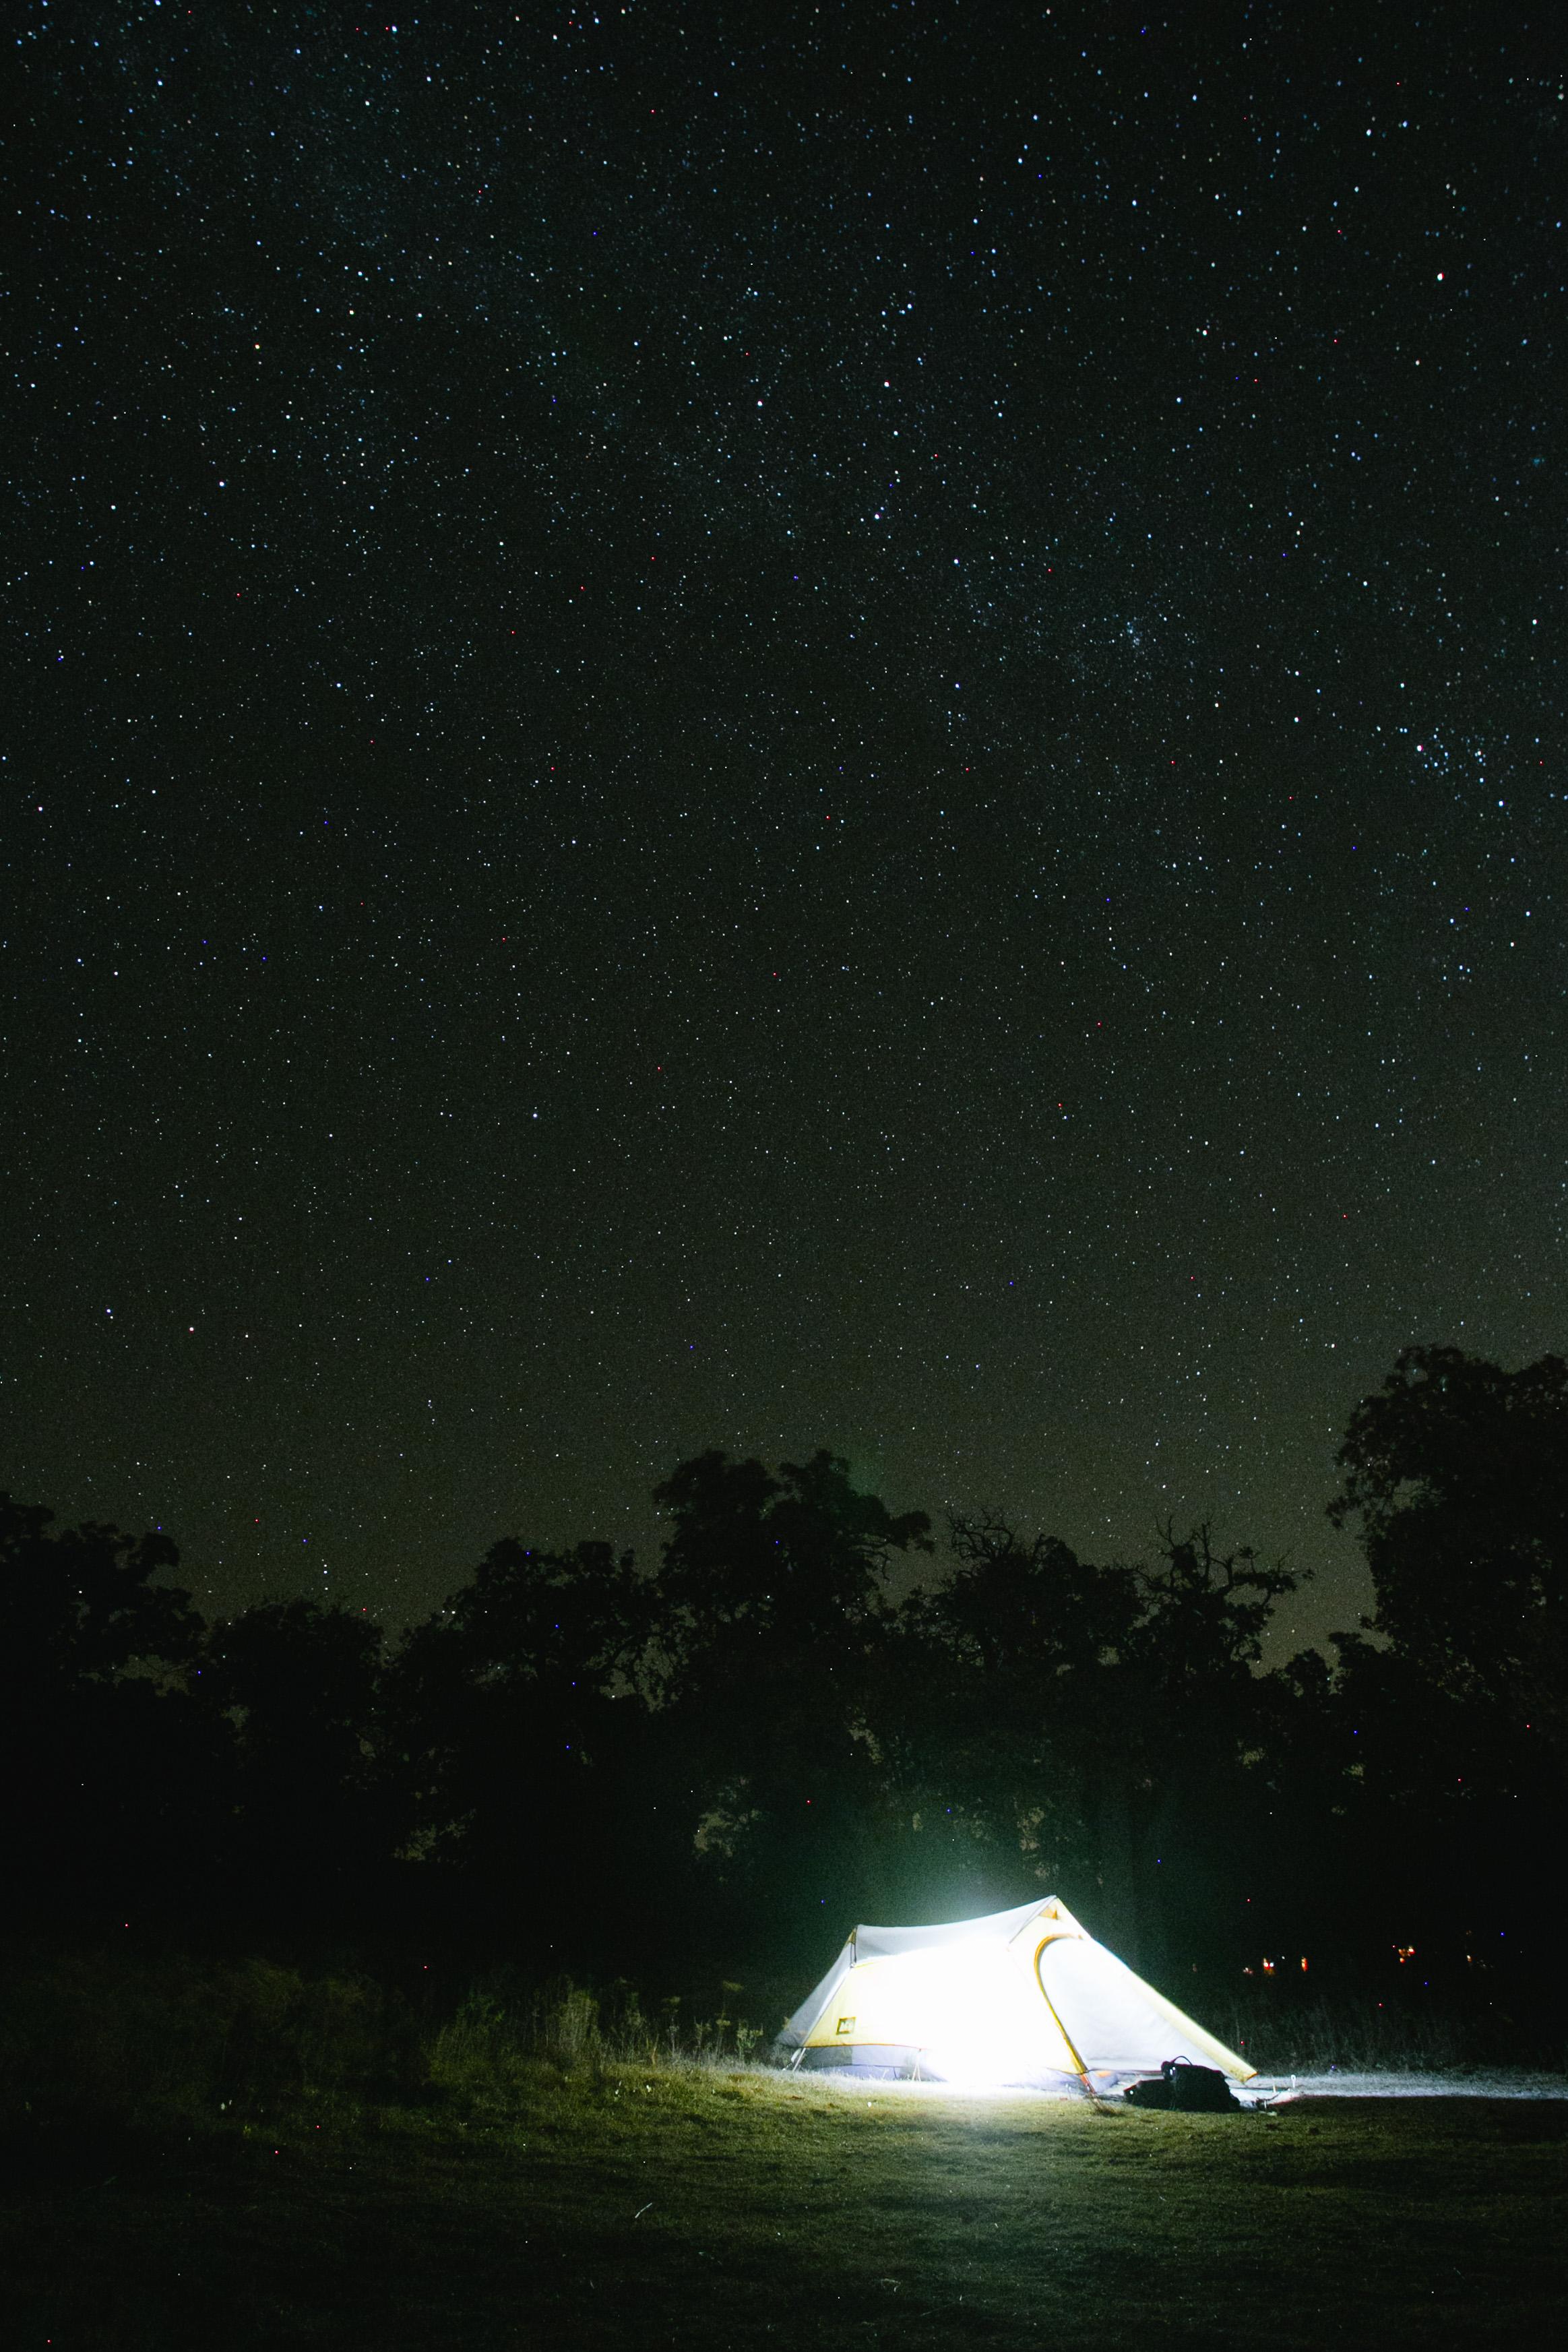 Daniel's tent